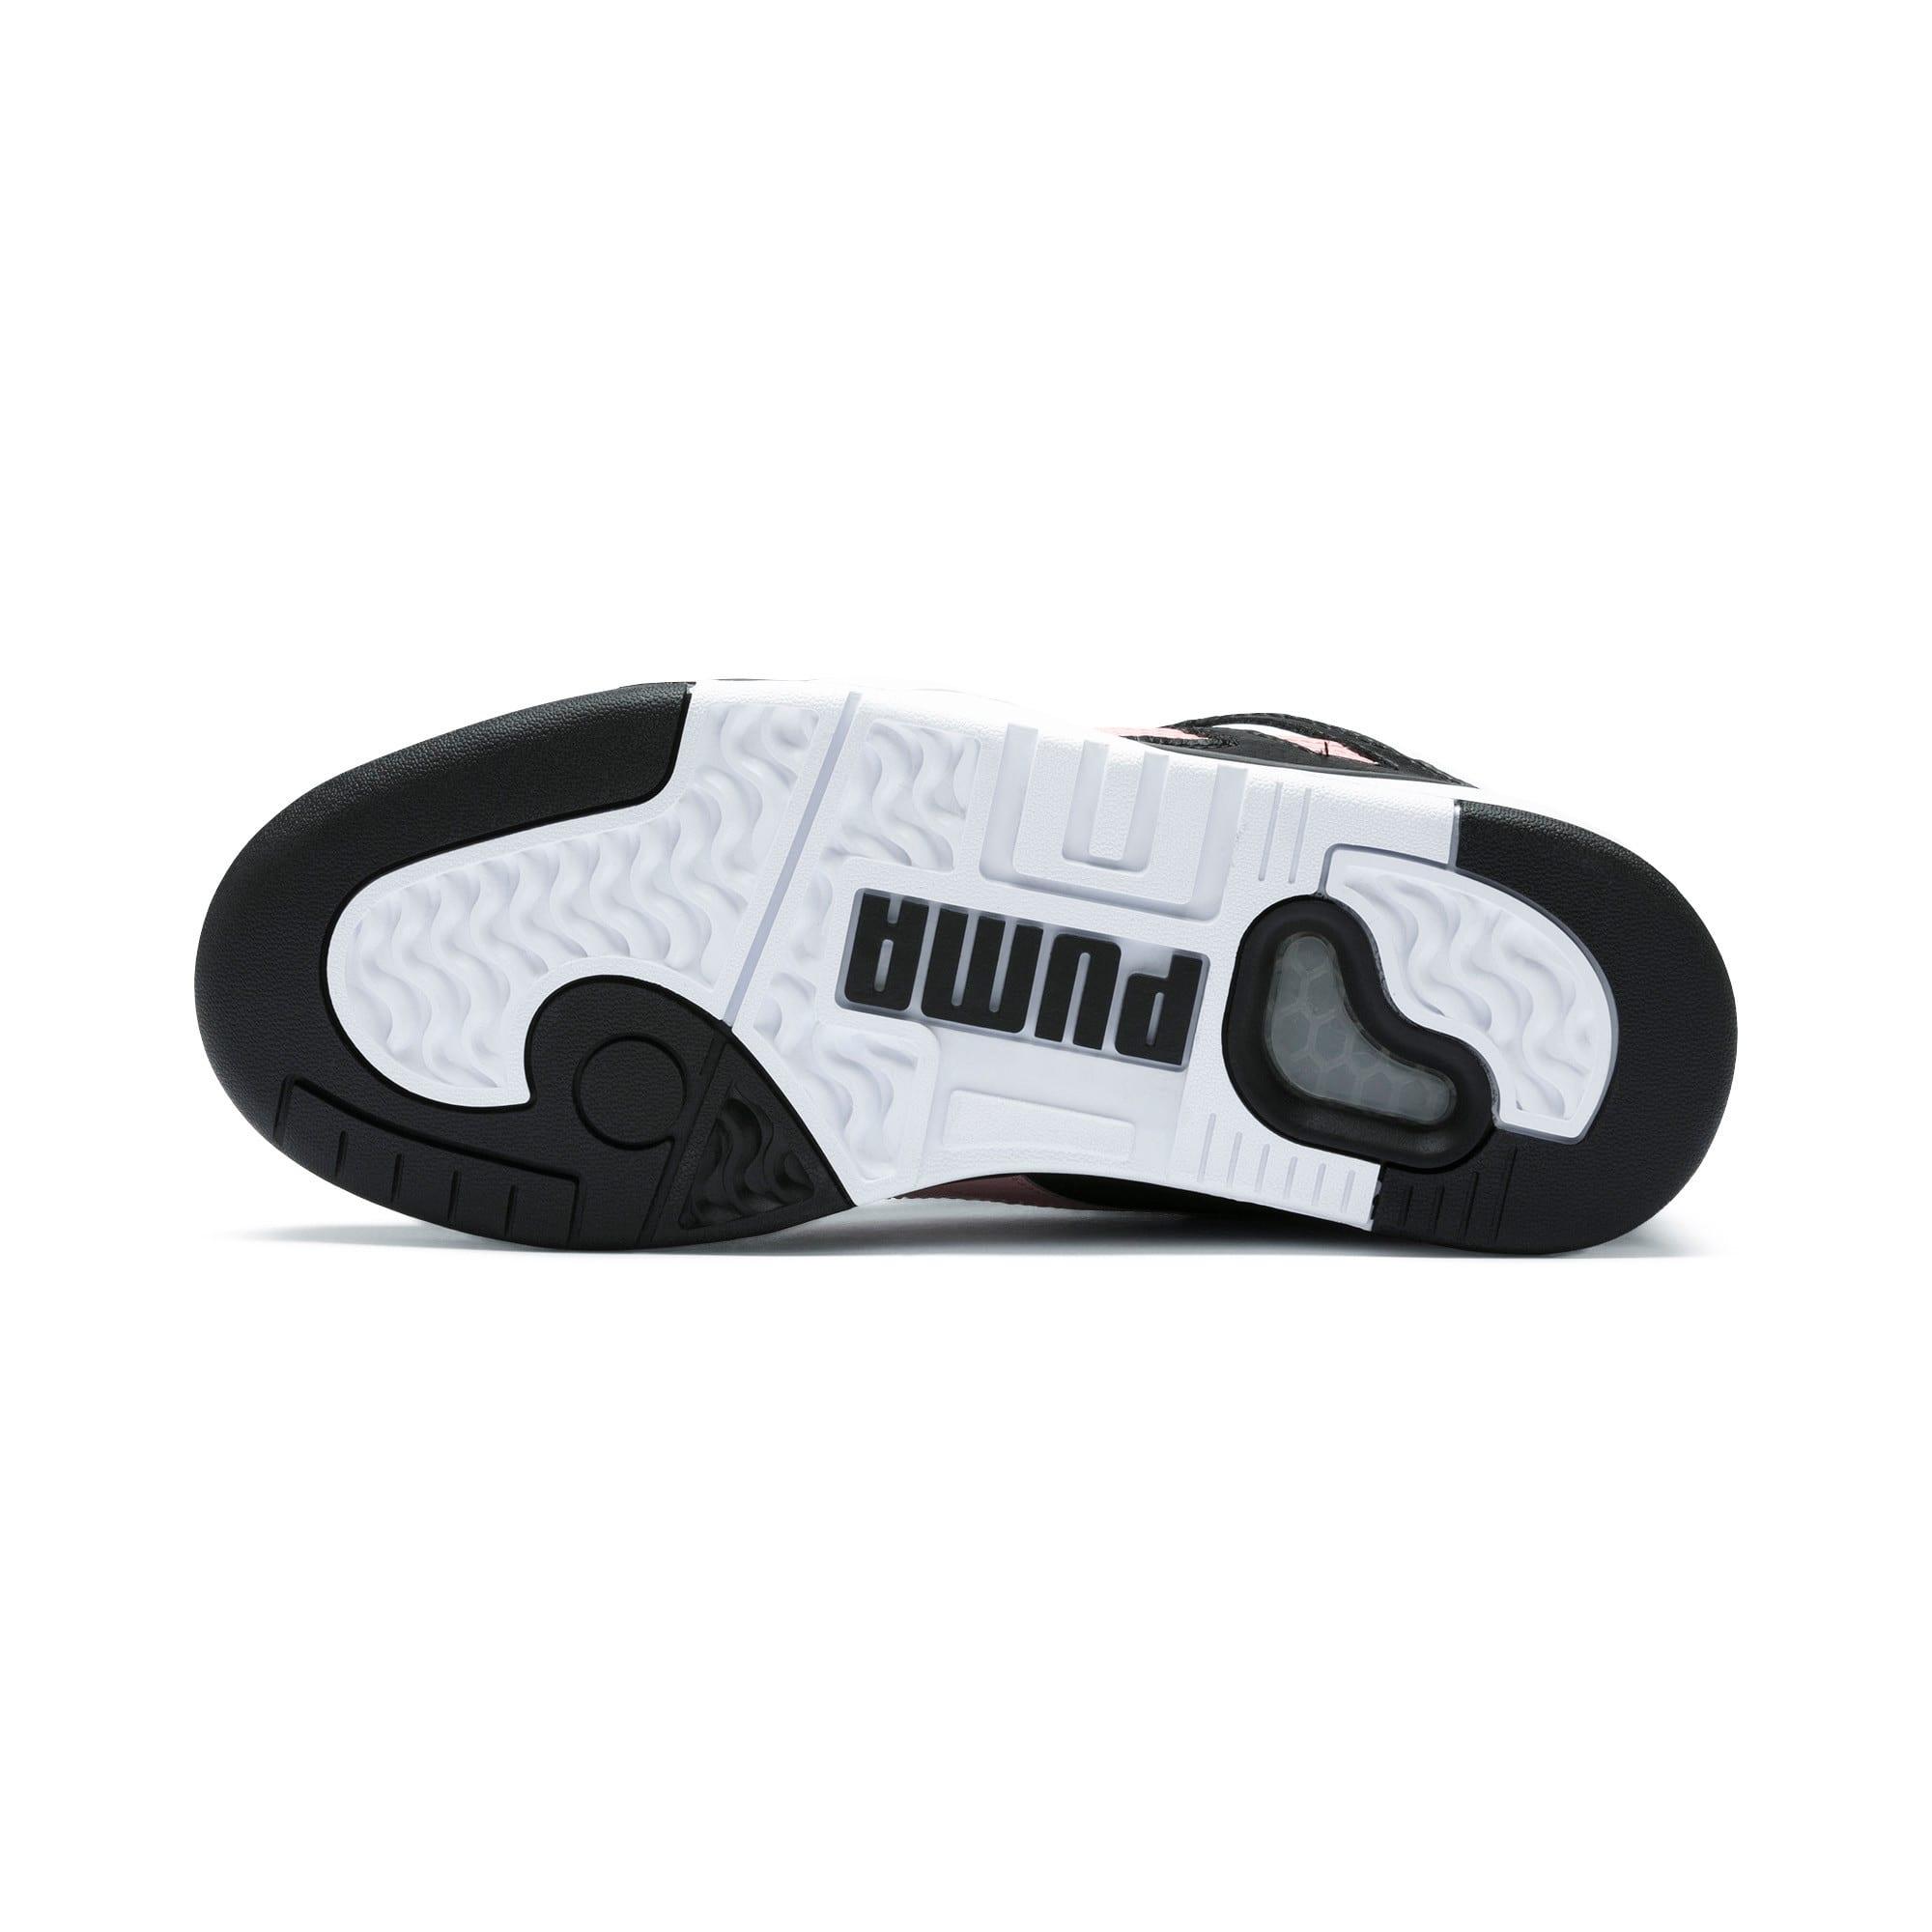 Thumbnail 5 of Palace Guard Colorblock Women's Sneakers, Puma Black-Puma White, medium